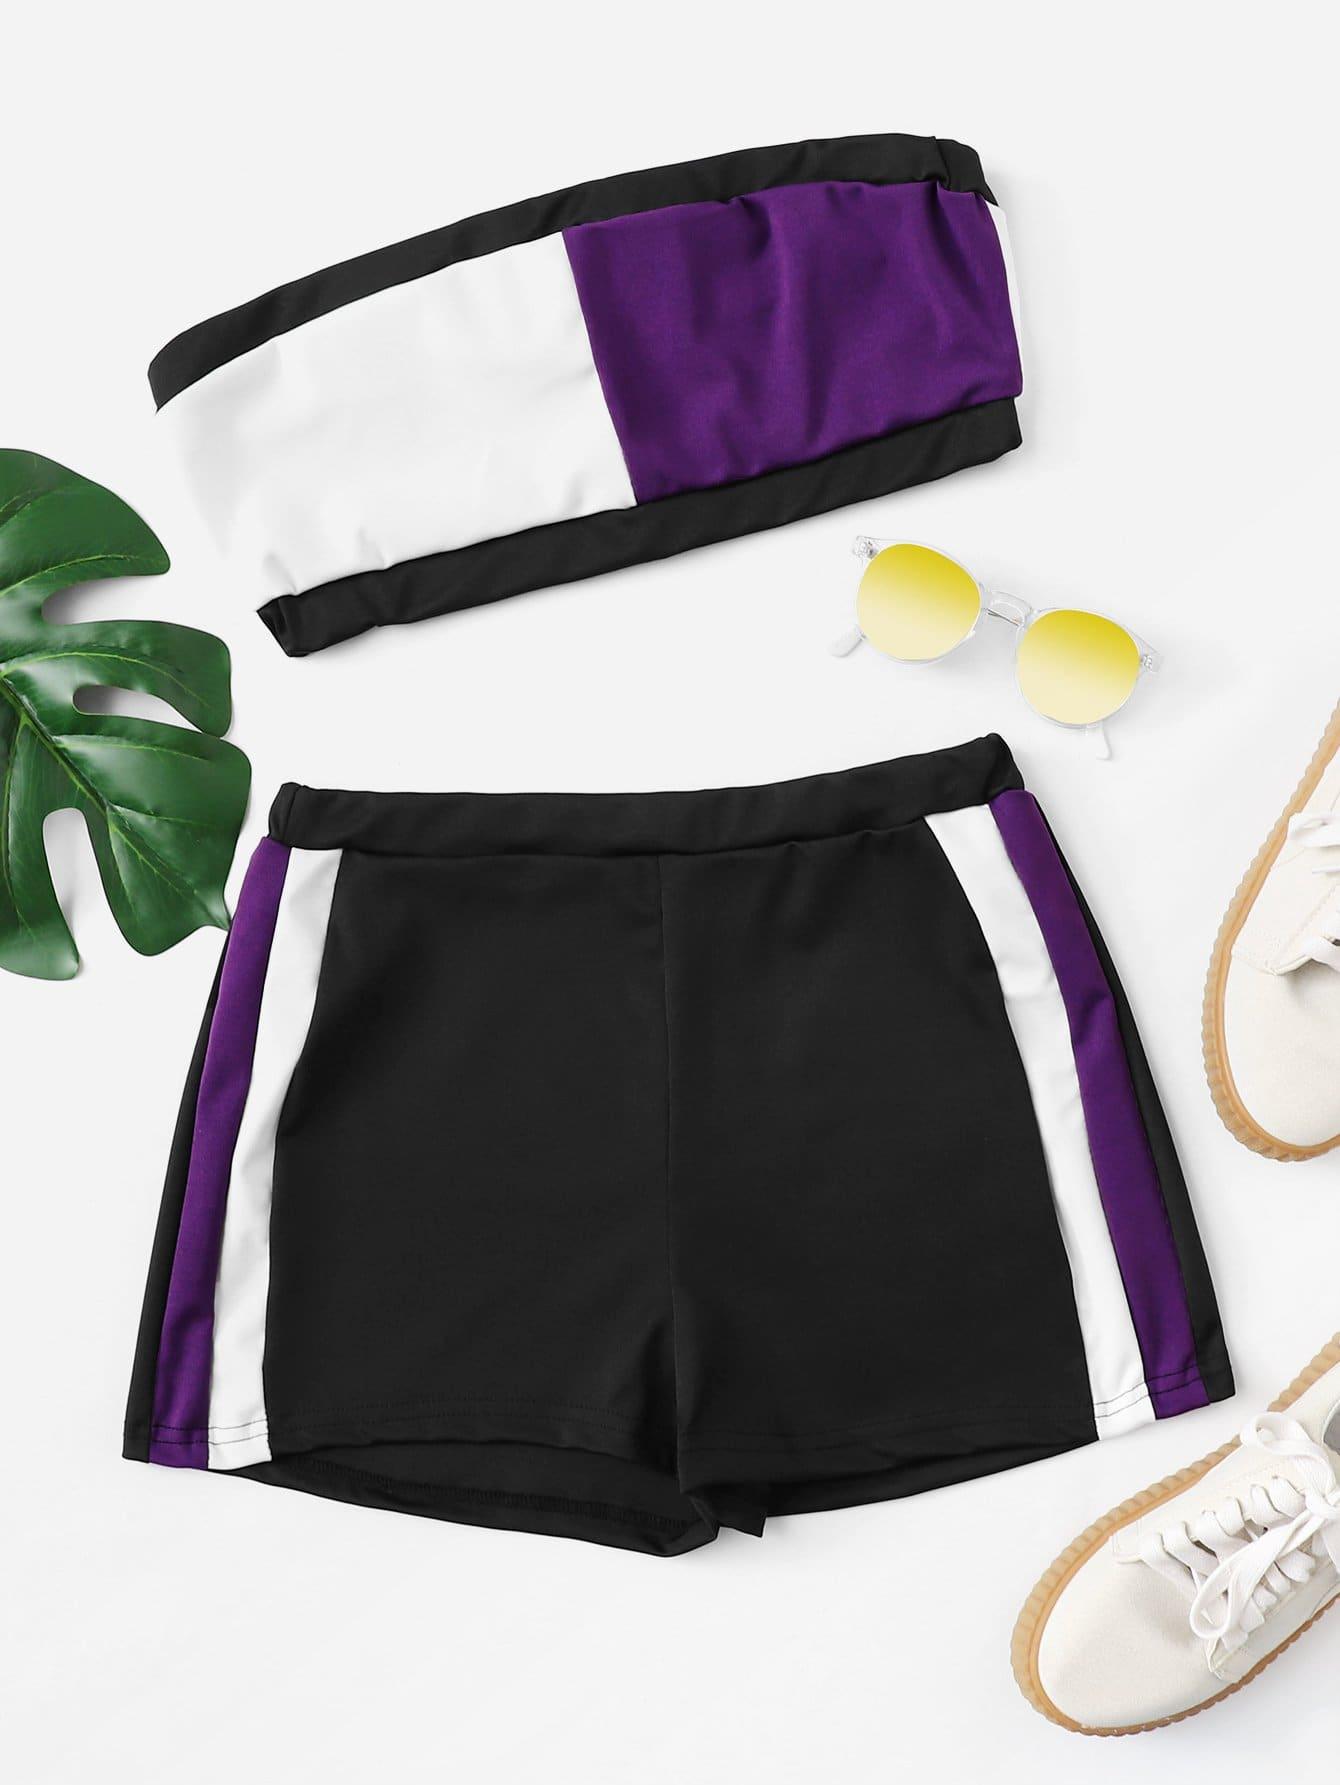 Colorblock Crop Top With Shorts black choker sleeveless crop top